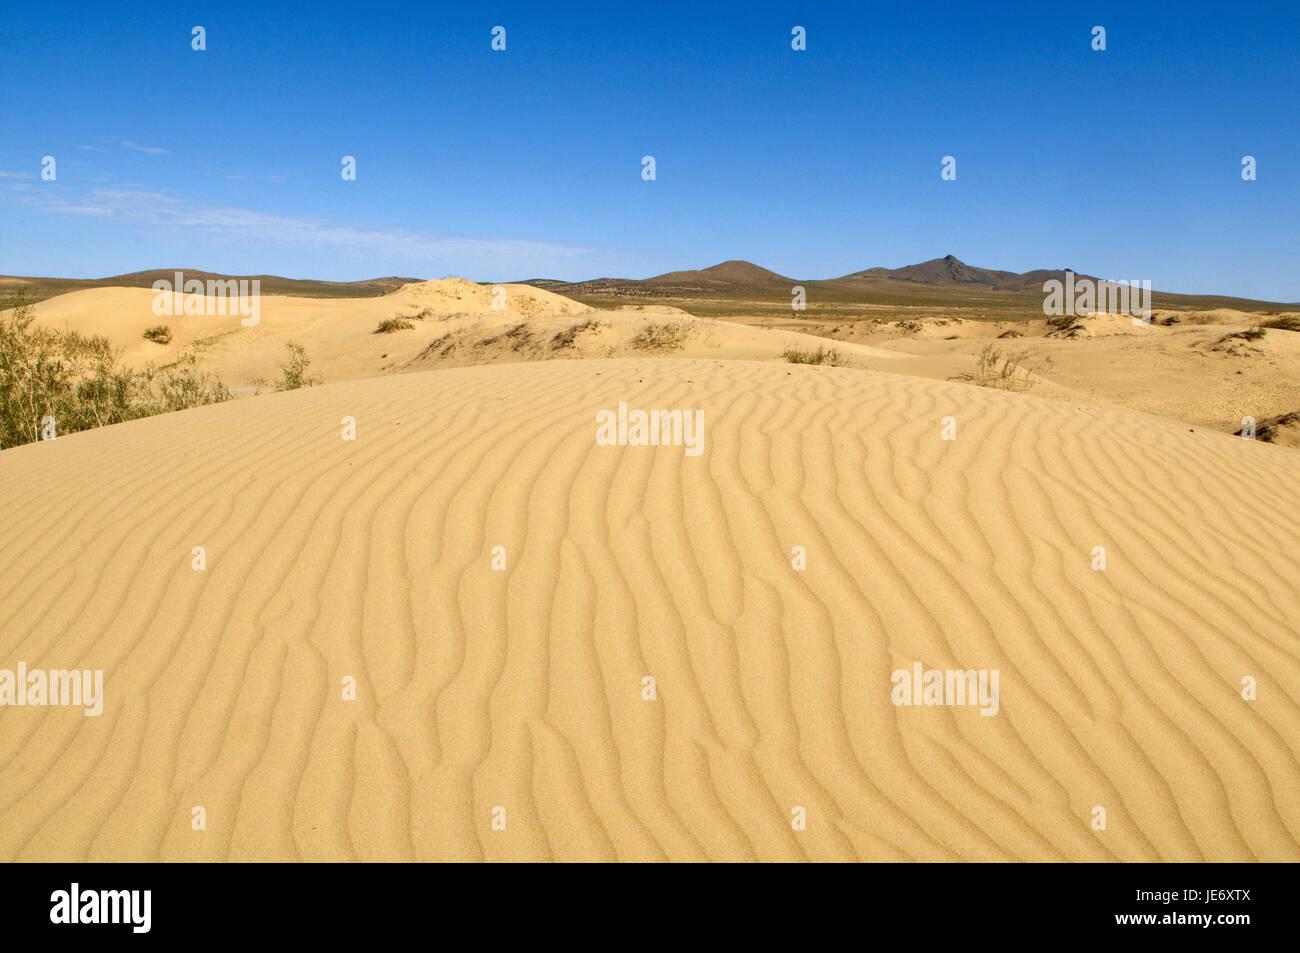 Mongolia, Central Asia, Ovorkhangai province, scenery, Sand dune, Mongolian steppe, Stock Photo